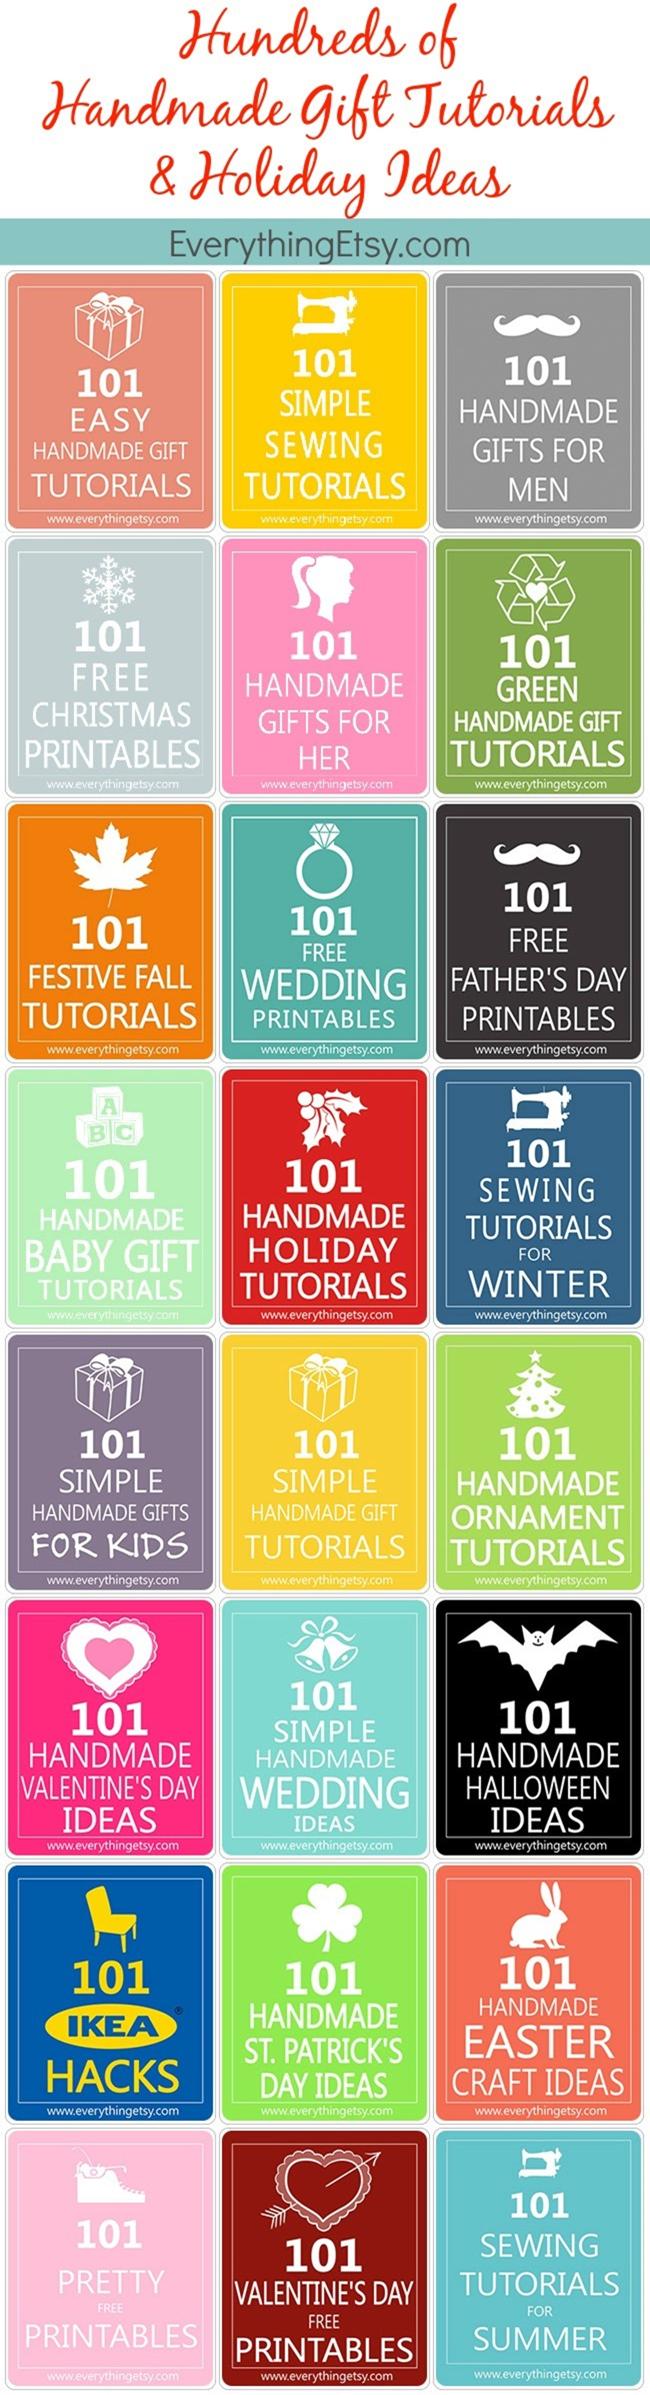 Handmade Gift Tutorials - Hundreds of Them!  EverythingEtsy